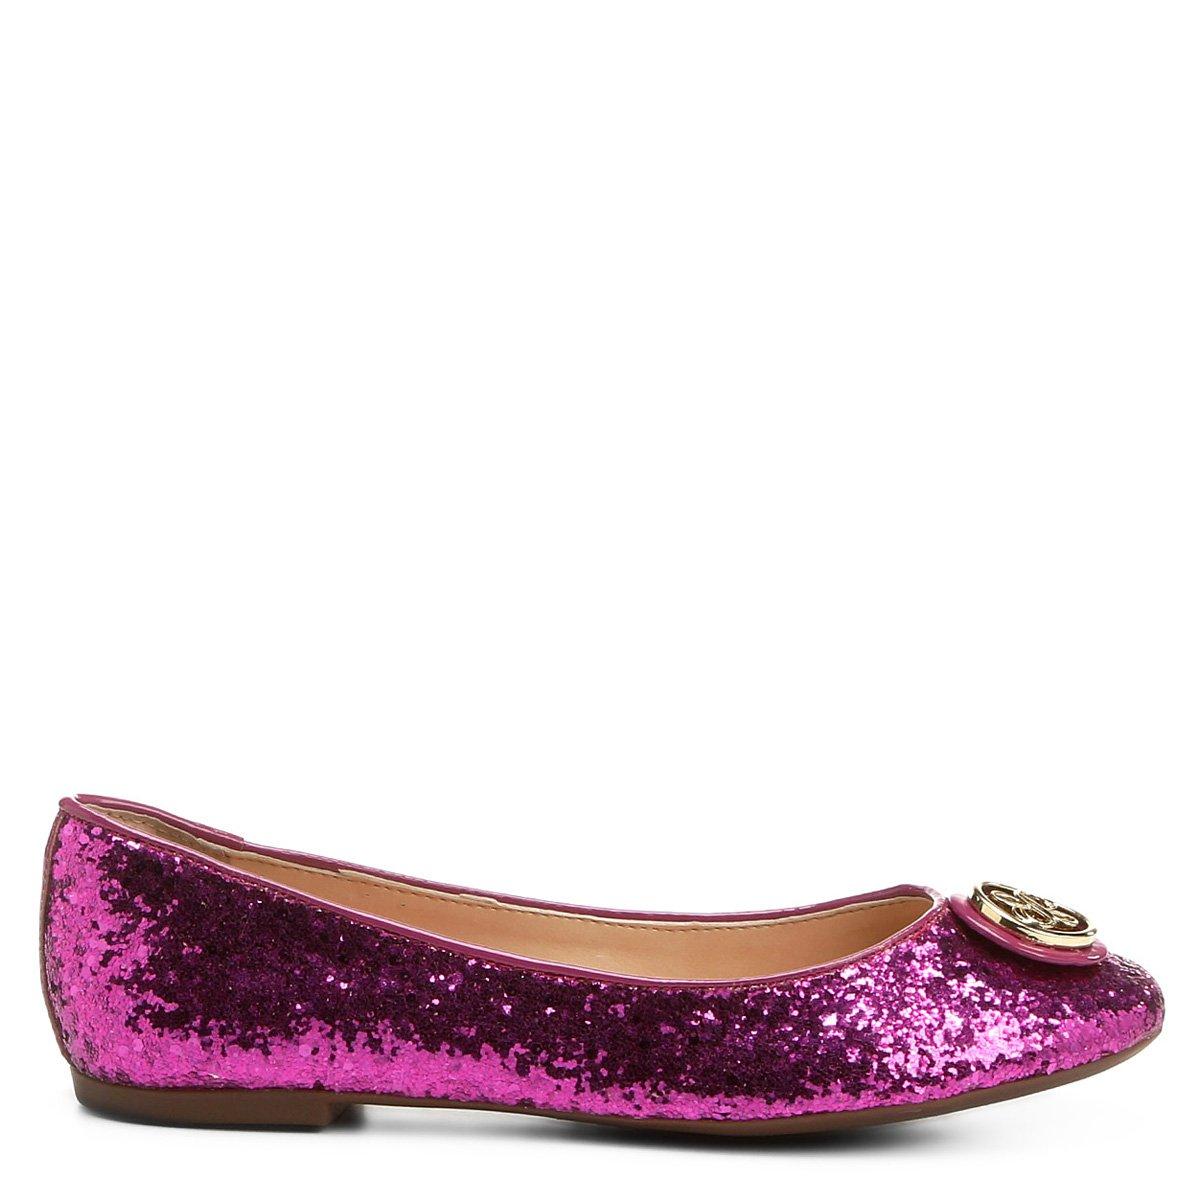 Medalha Sapatilha Shoestock Shoestock Glitter Pink Sapatilha Medalha Glitter 6q46rwY